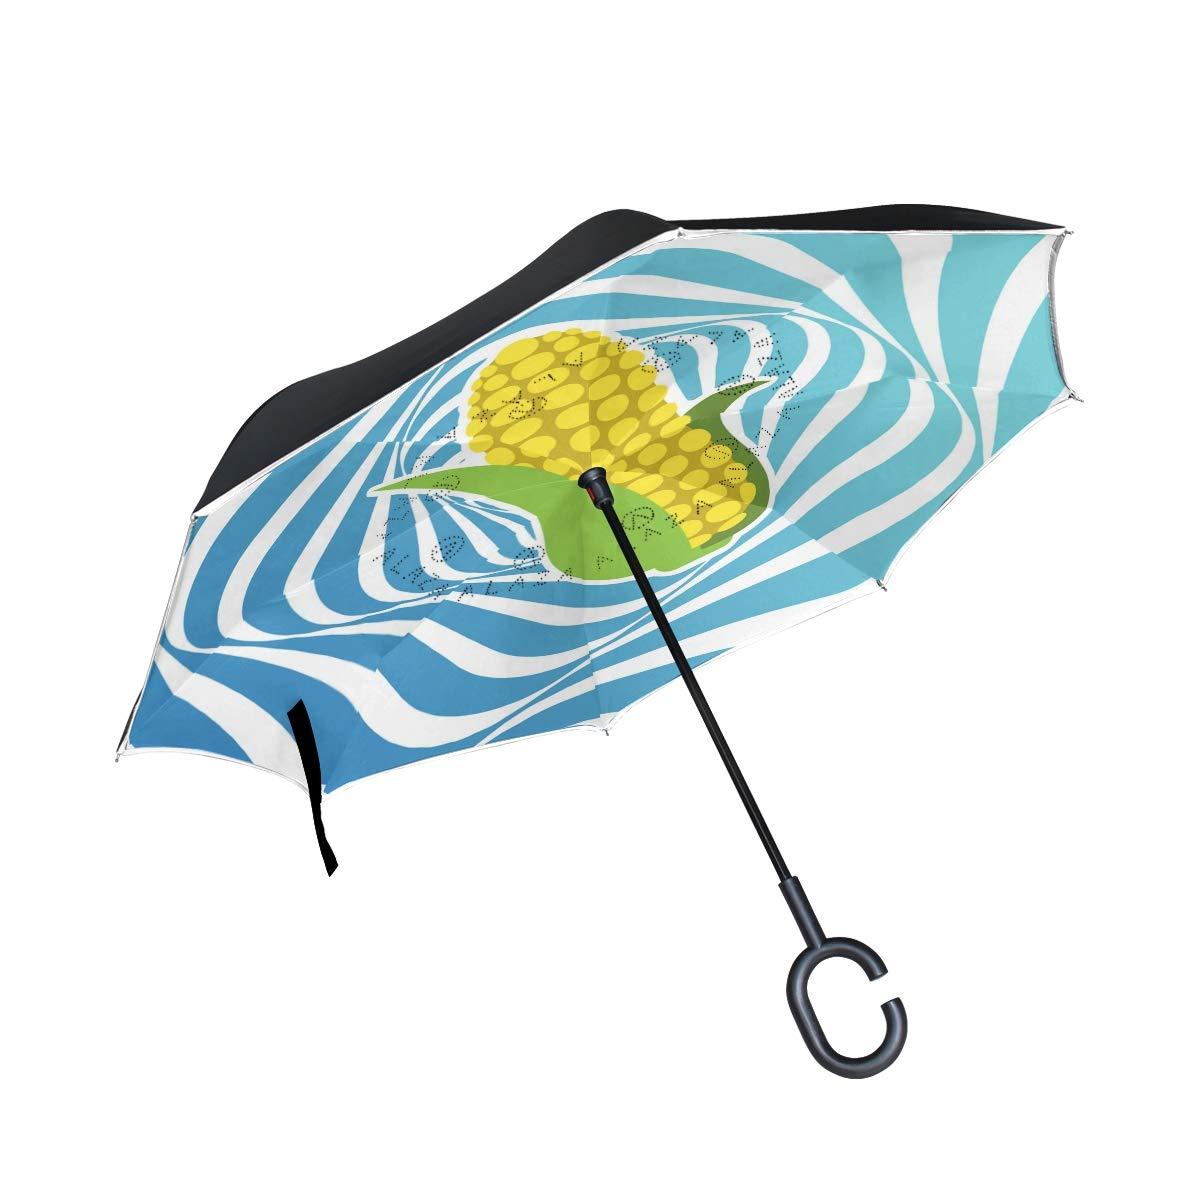 DKRetro Double Layer Fun Corn Inverted Umbrellas- Reverse Folding Umbrella for Car, C-Shaped Handle Umbrella with Light Reflection Strip